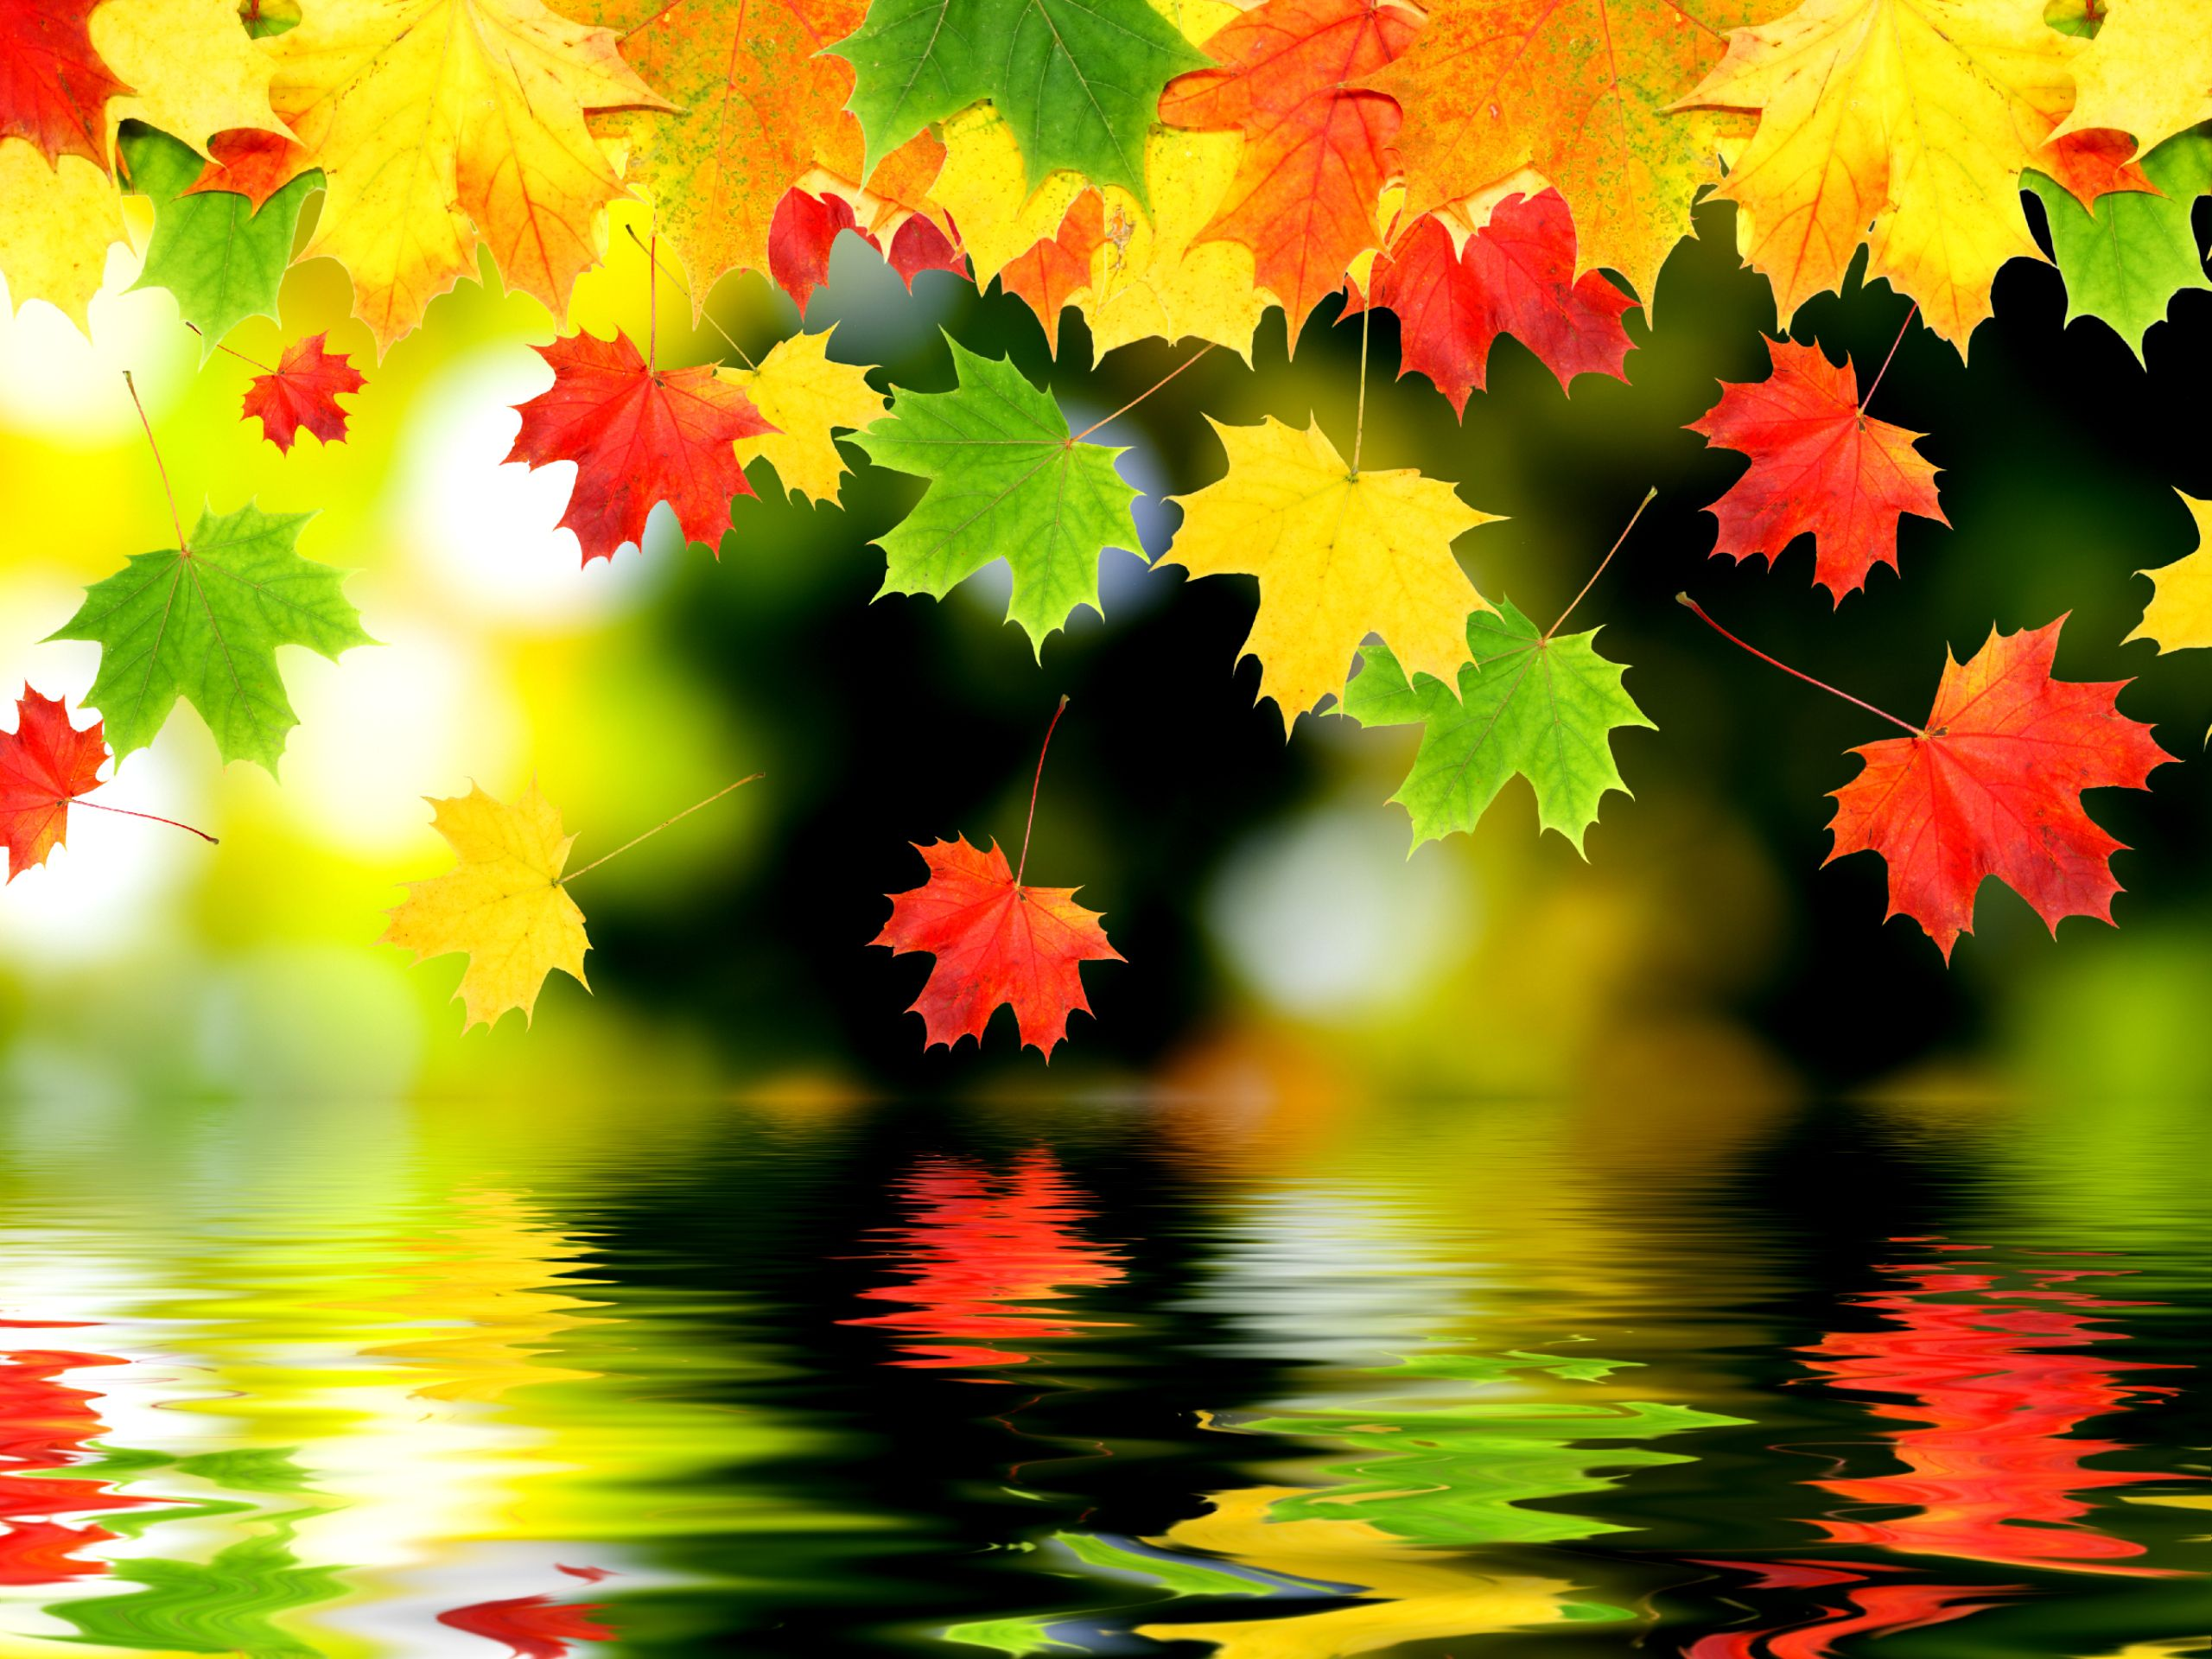 Fall Wallpaper 6y7 Wallpaper Autumn Leaves Wallpaper Fall Wallpaper Iphone 6 Plus Wallpaper